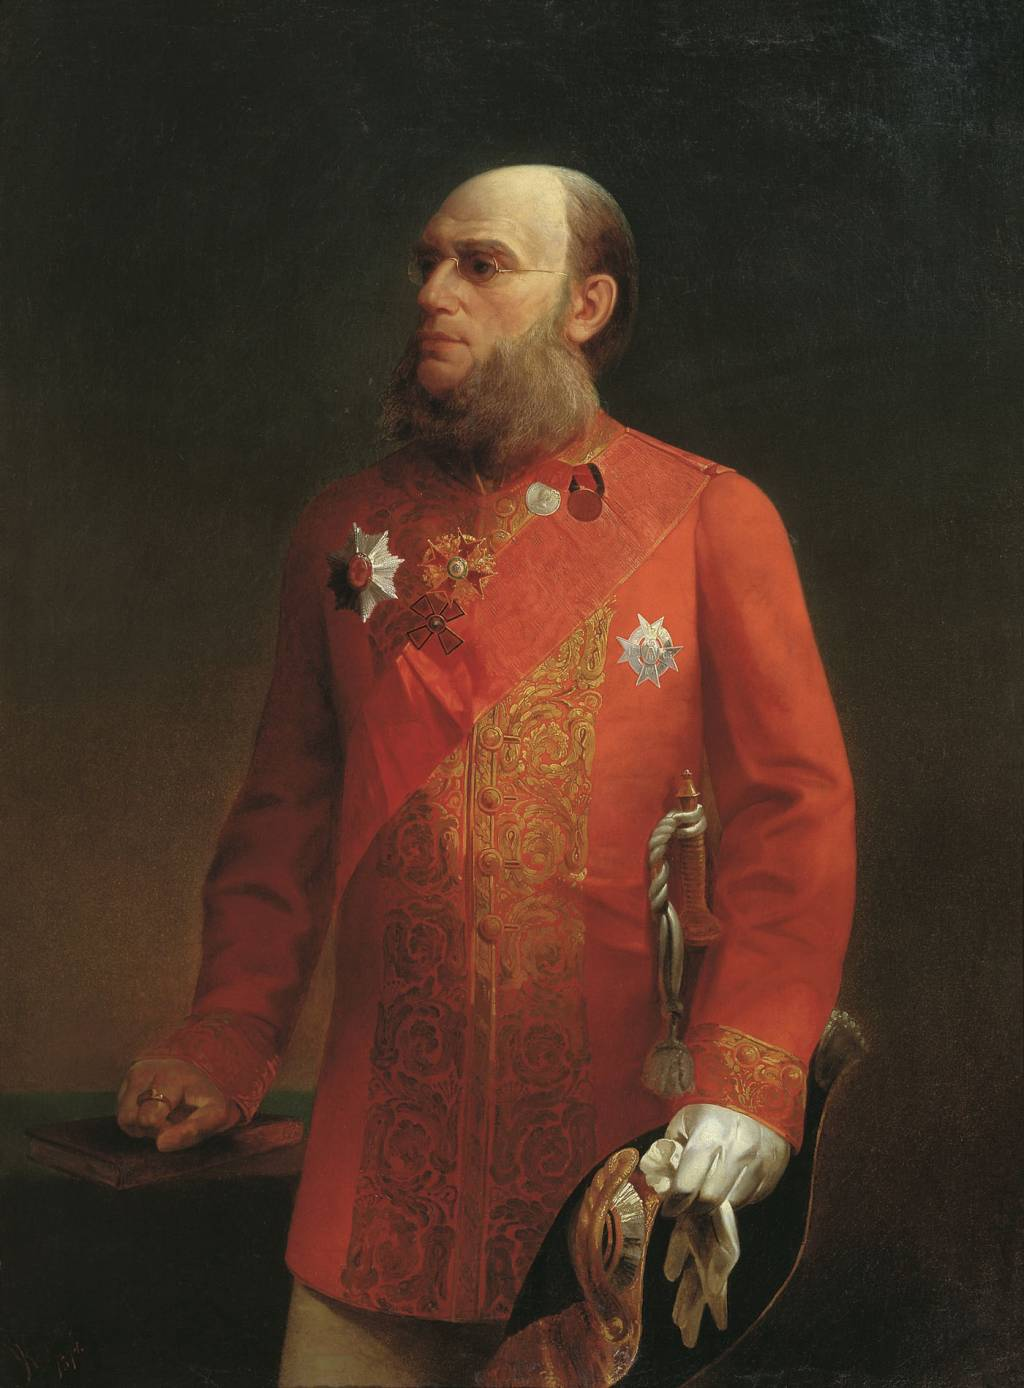 KolesovSemjkopv-TjanShanskii1874.jpg